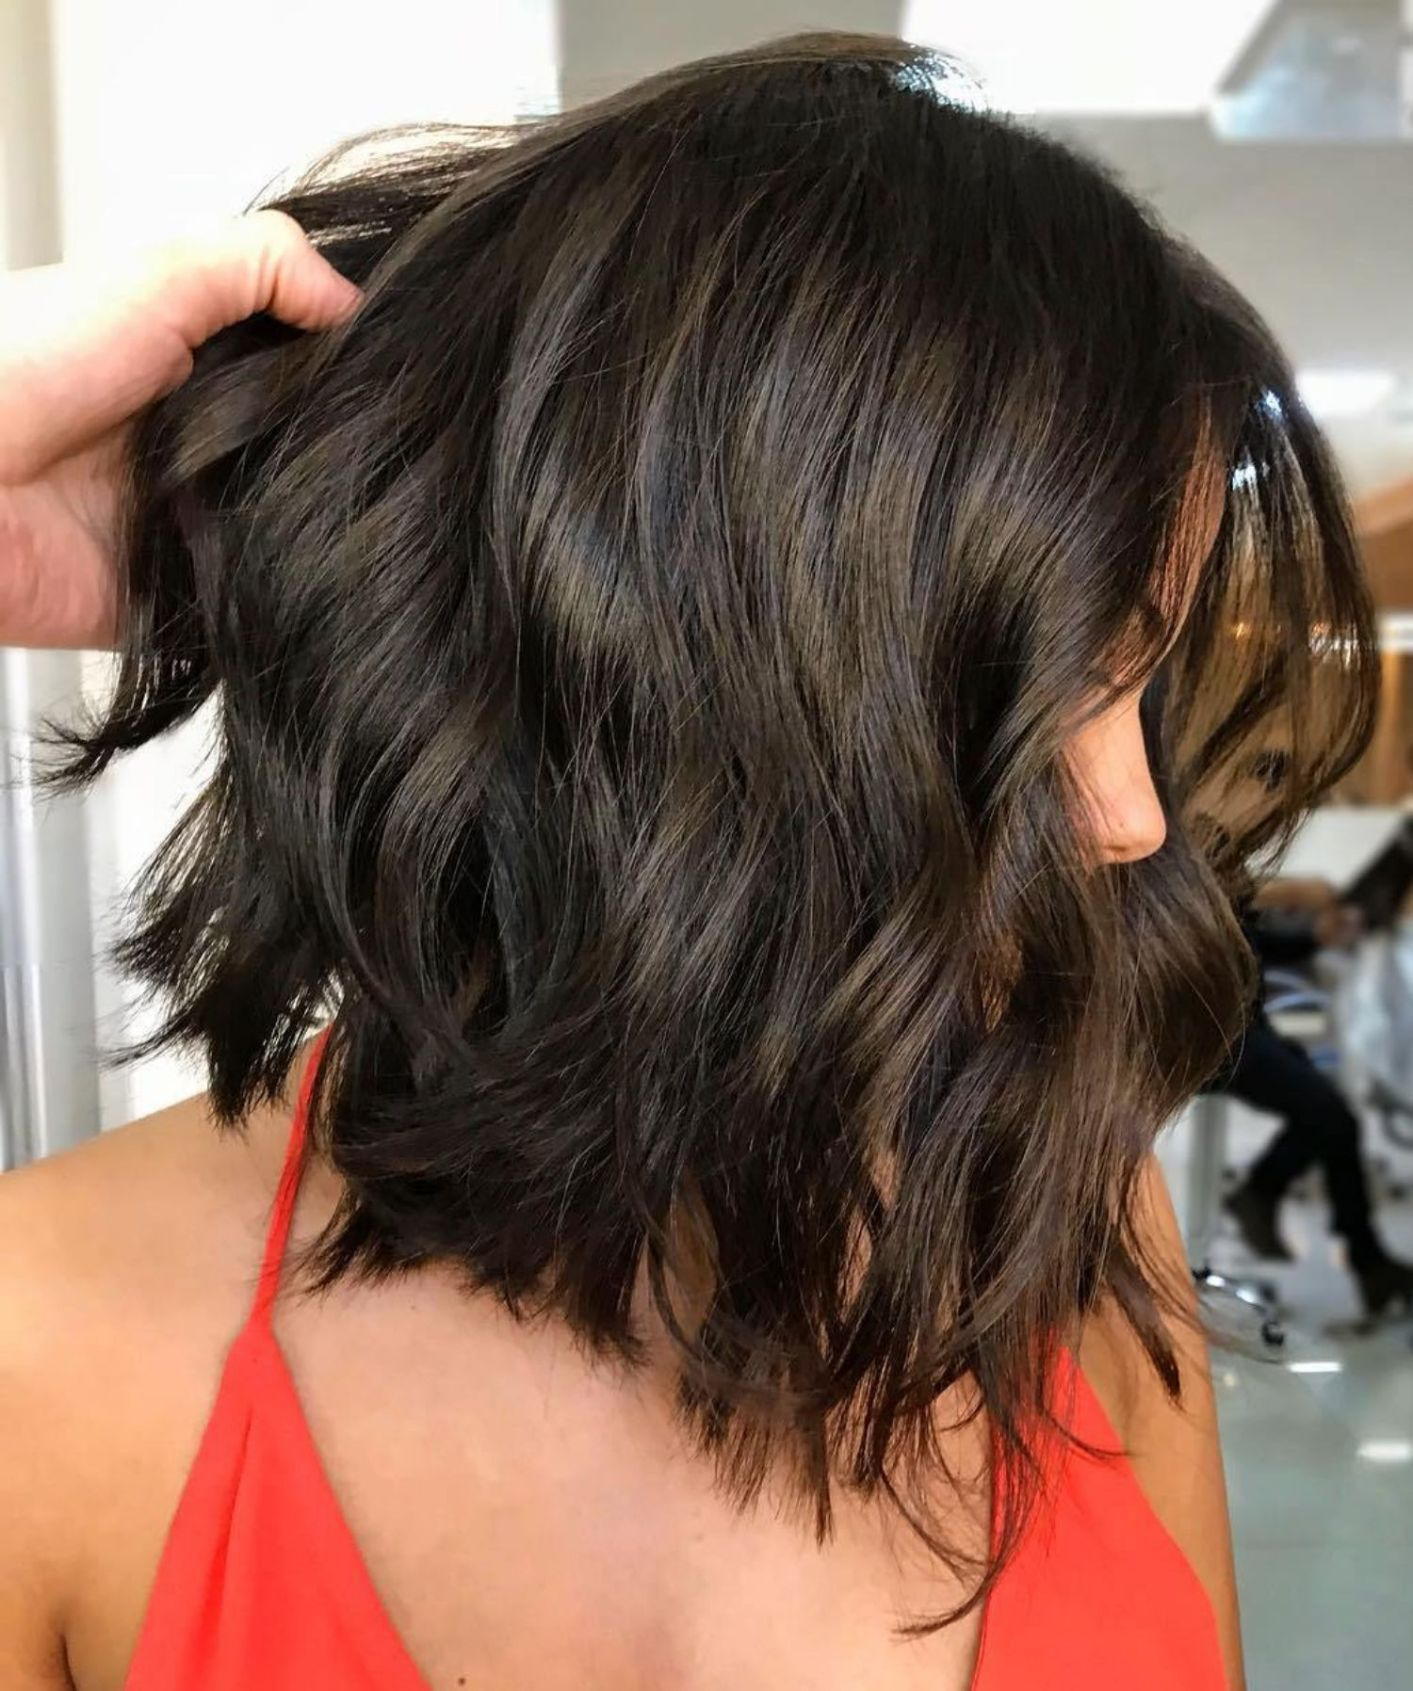 Pin On Haare Frisuren